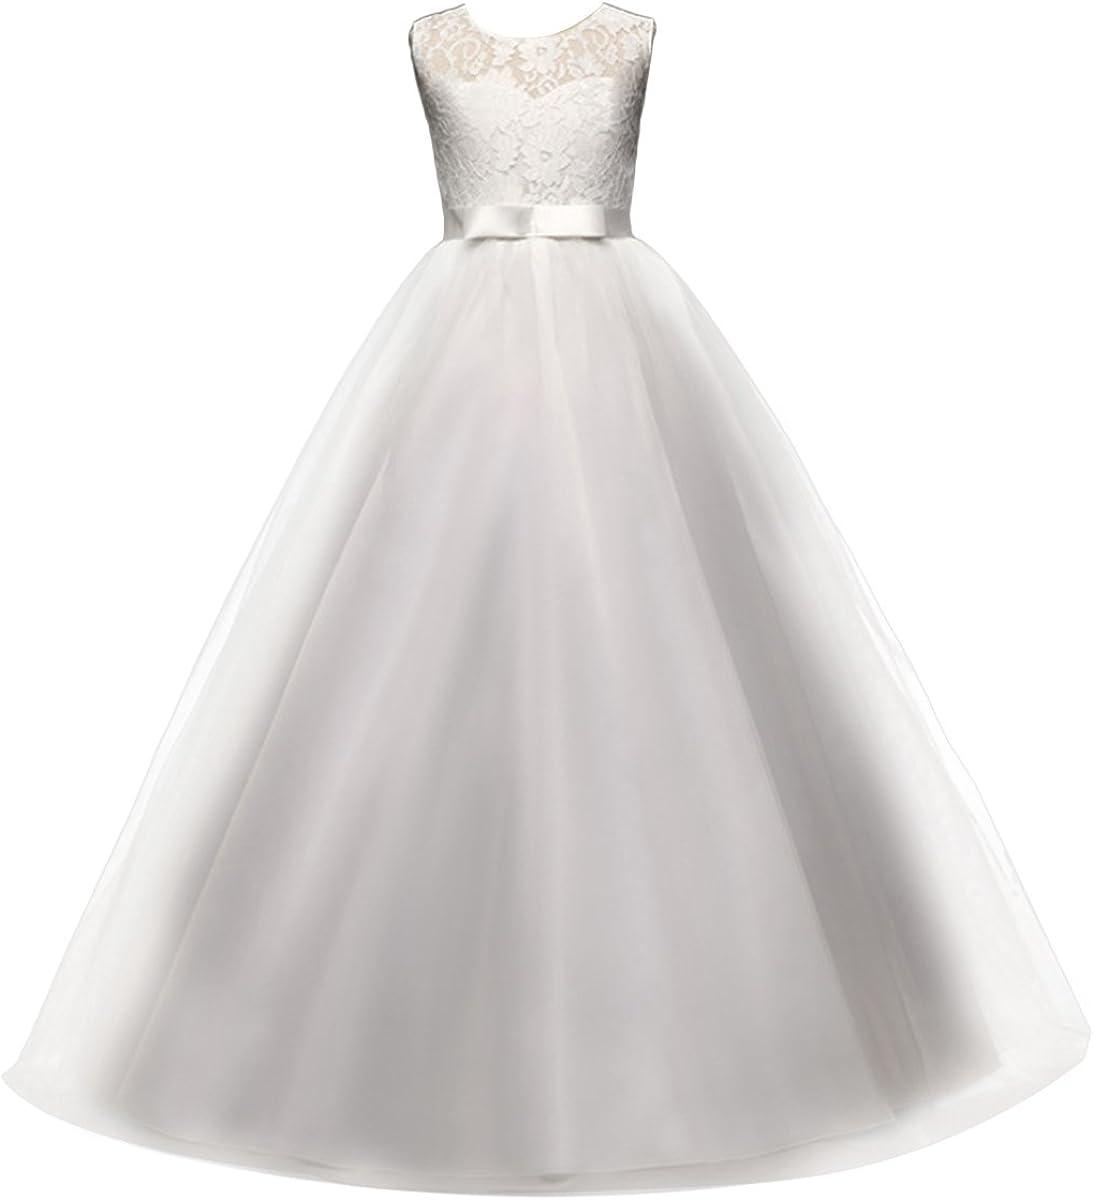 Yaphyee Flower In stock Girl Kid Princess Pageant Superlatite Bri Formal Long Wedding